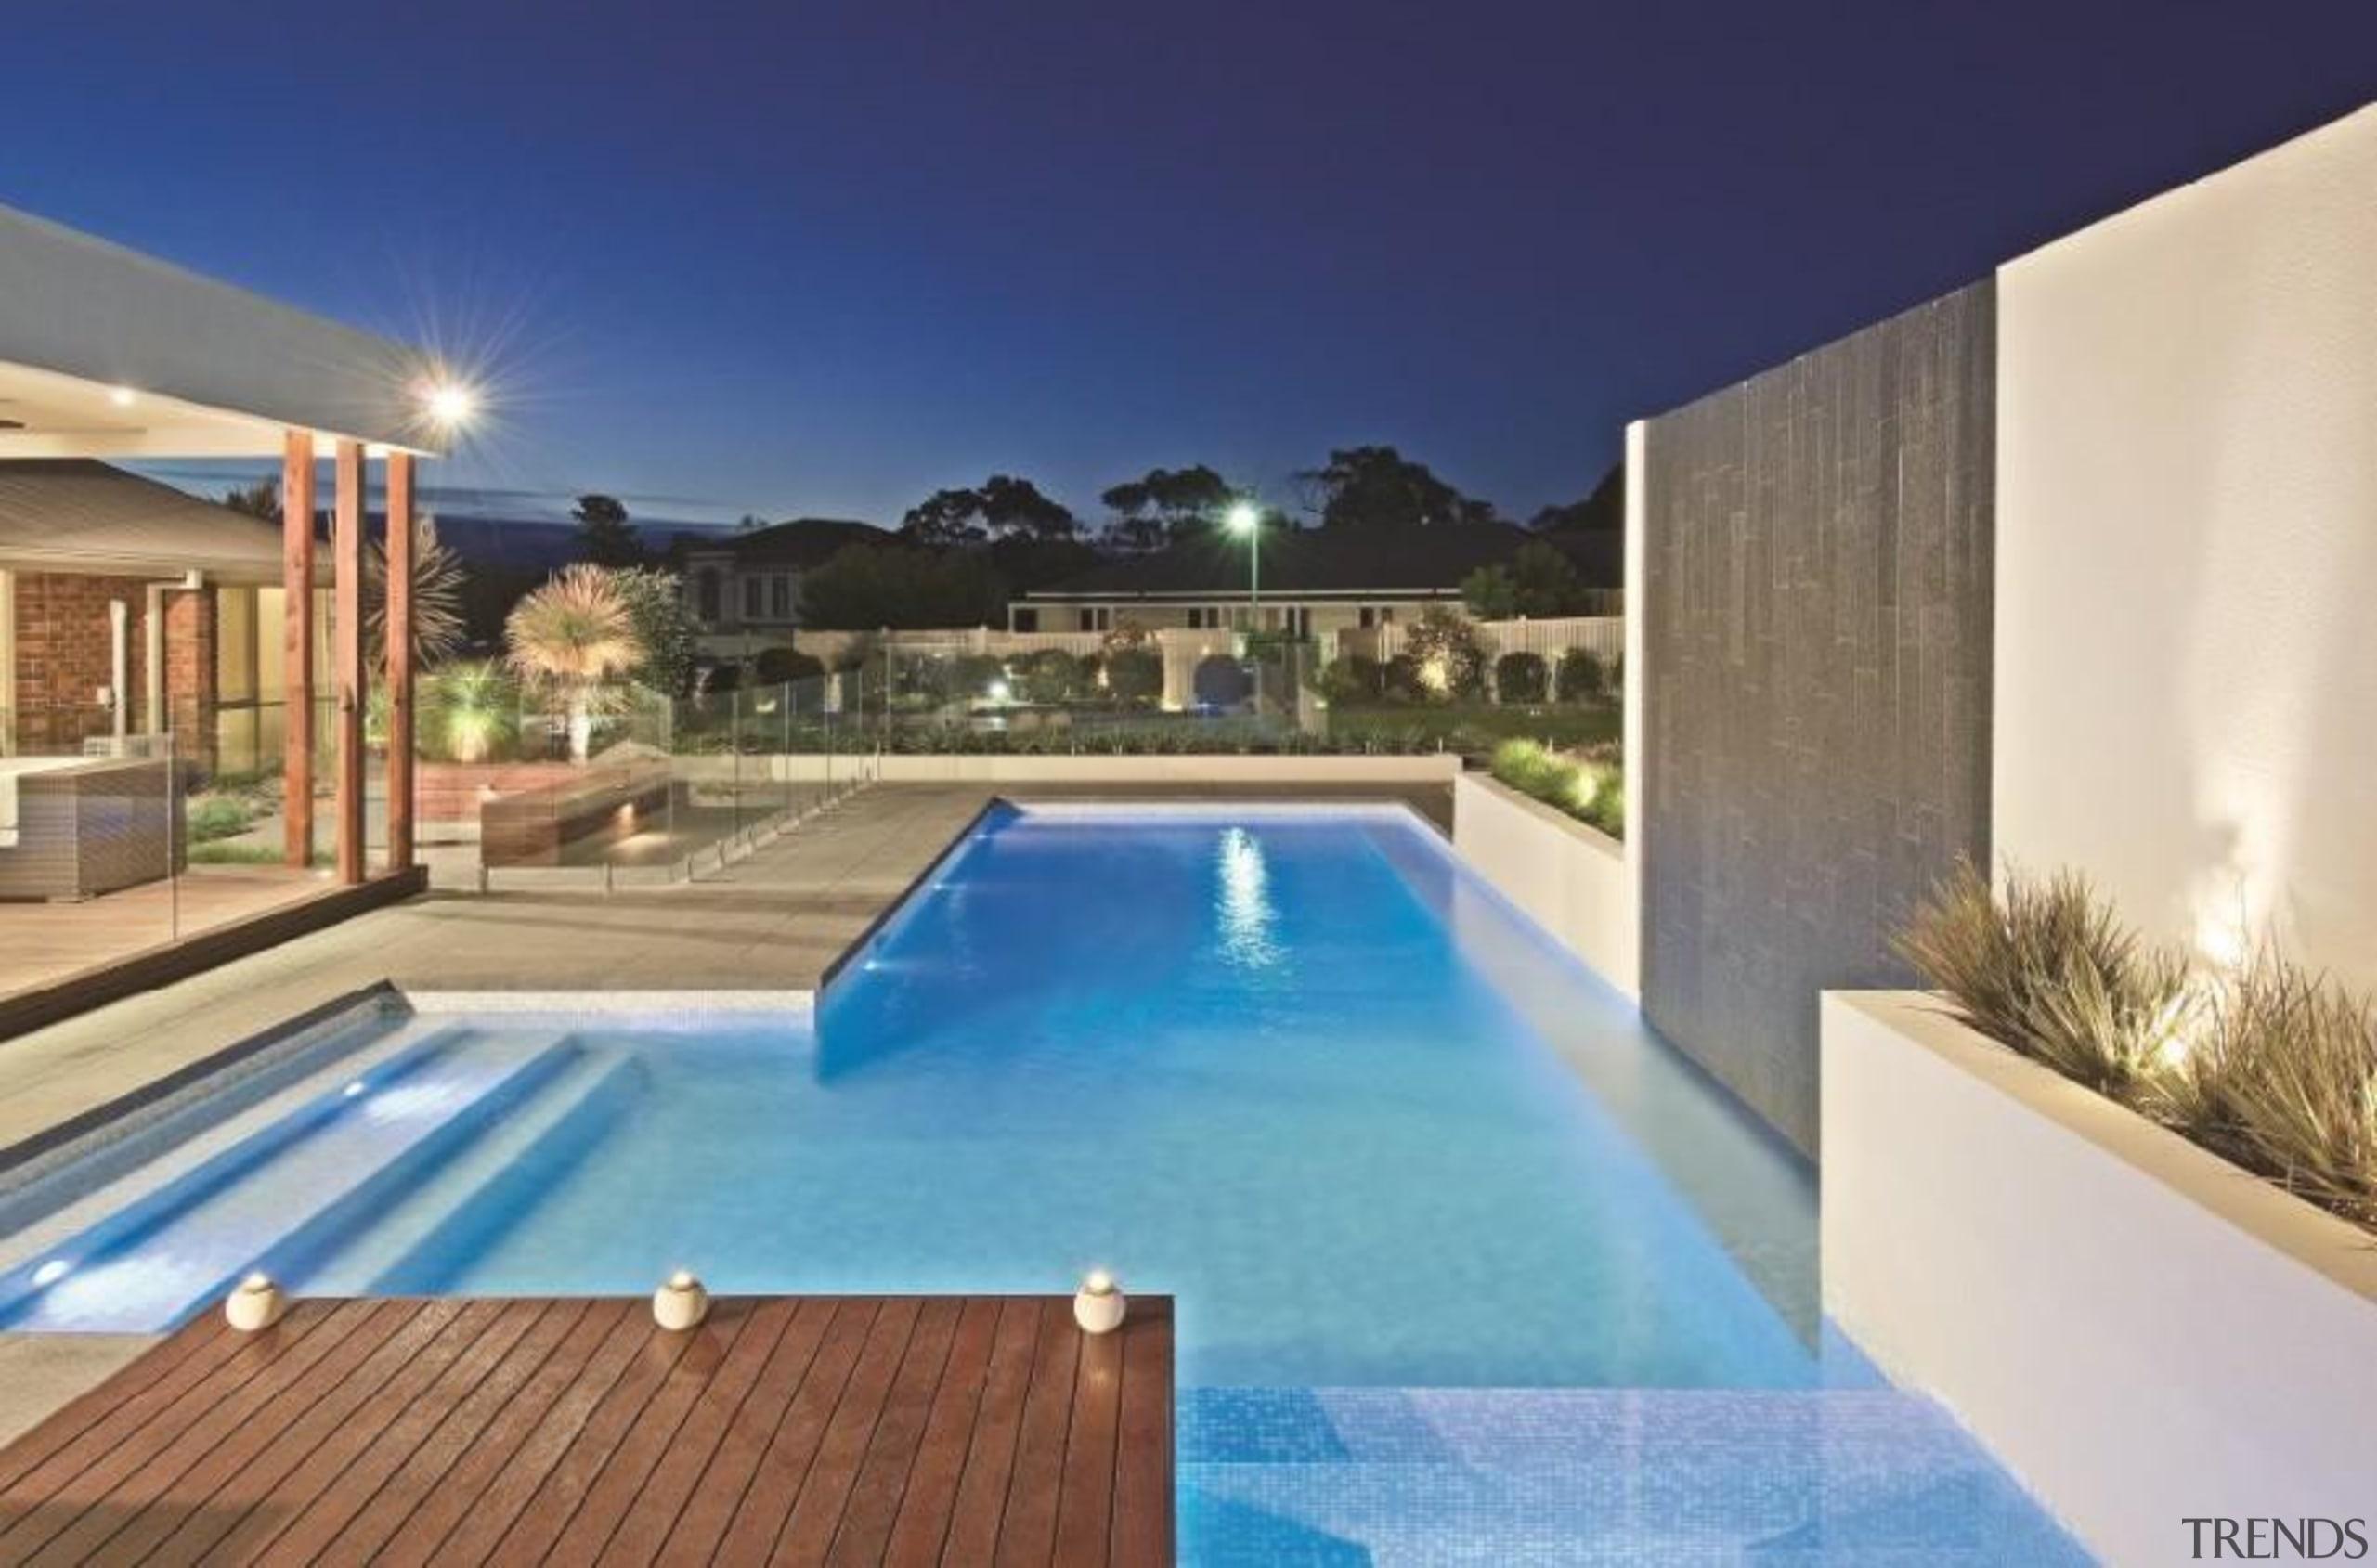 Bisazza swimming pool mosaic tiles - Bisazza Range apartment, condominium, estate, home, house, leisure, property, real estate, residential area, resort, swimming pool, villa